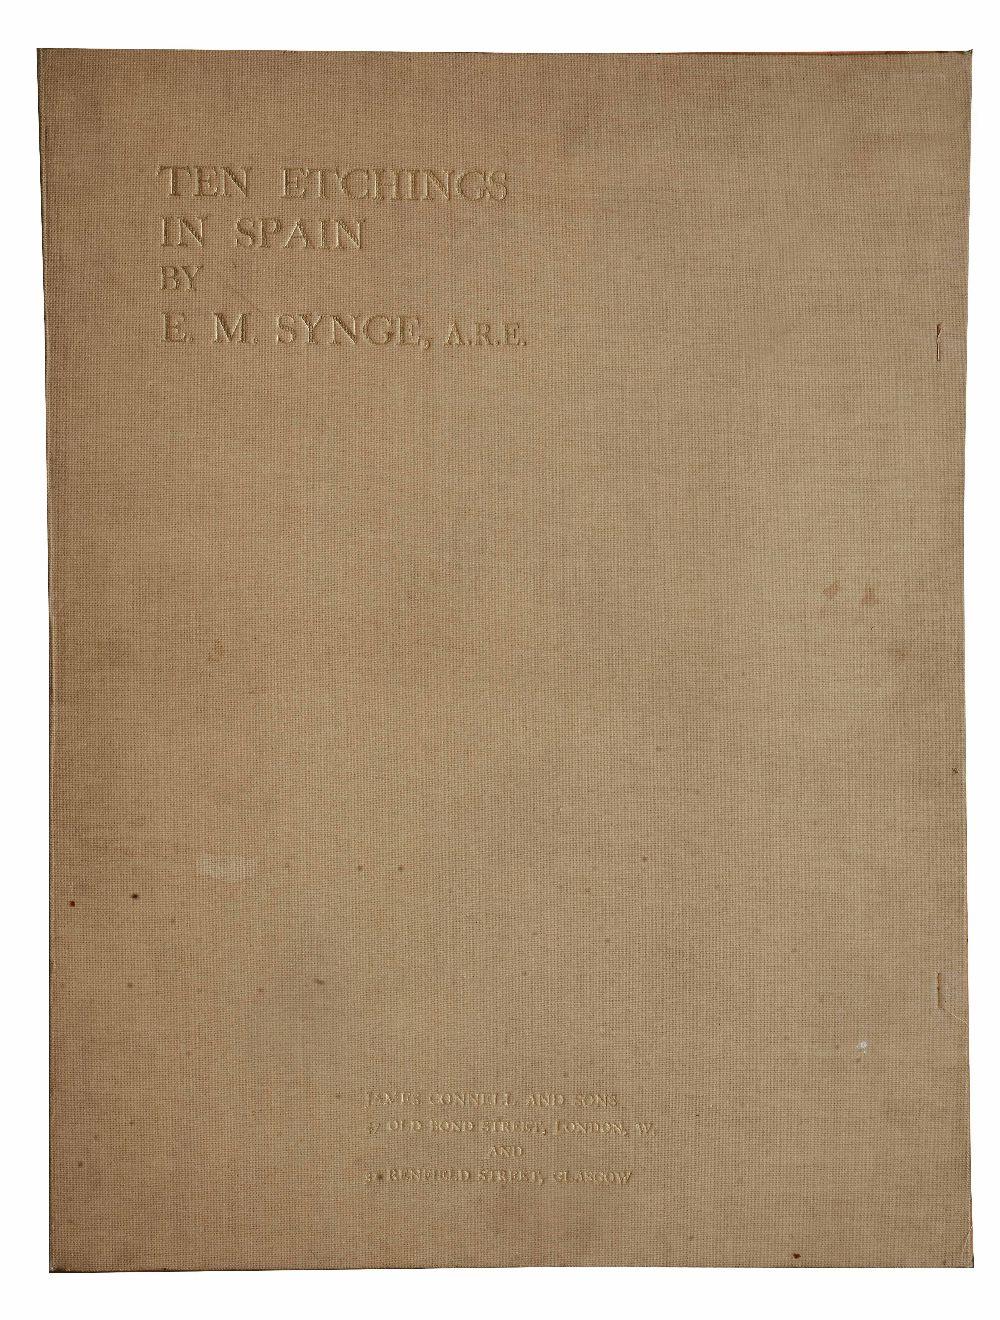 Lot 36 - EDWARD MILLINGTON SYNGE (1860-1913) 'Ten Etchings in Spain', etchings, pencil signed in the